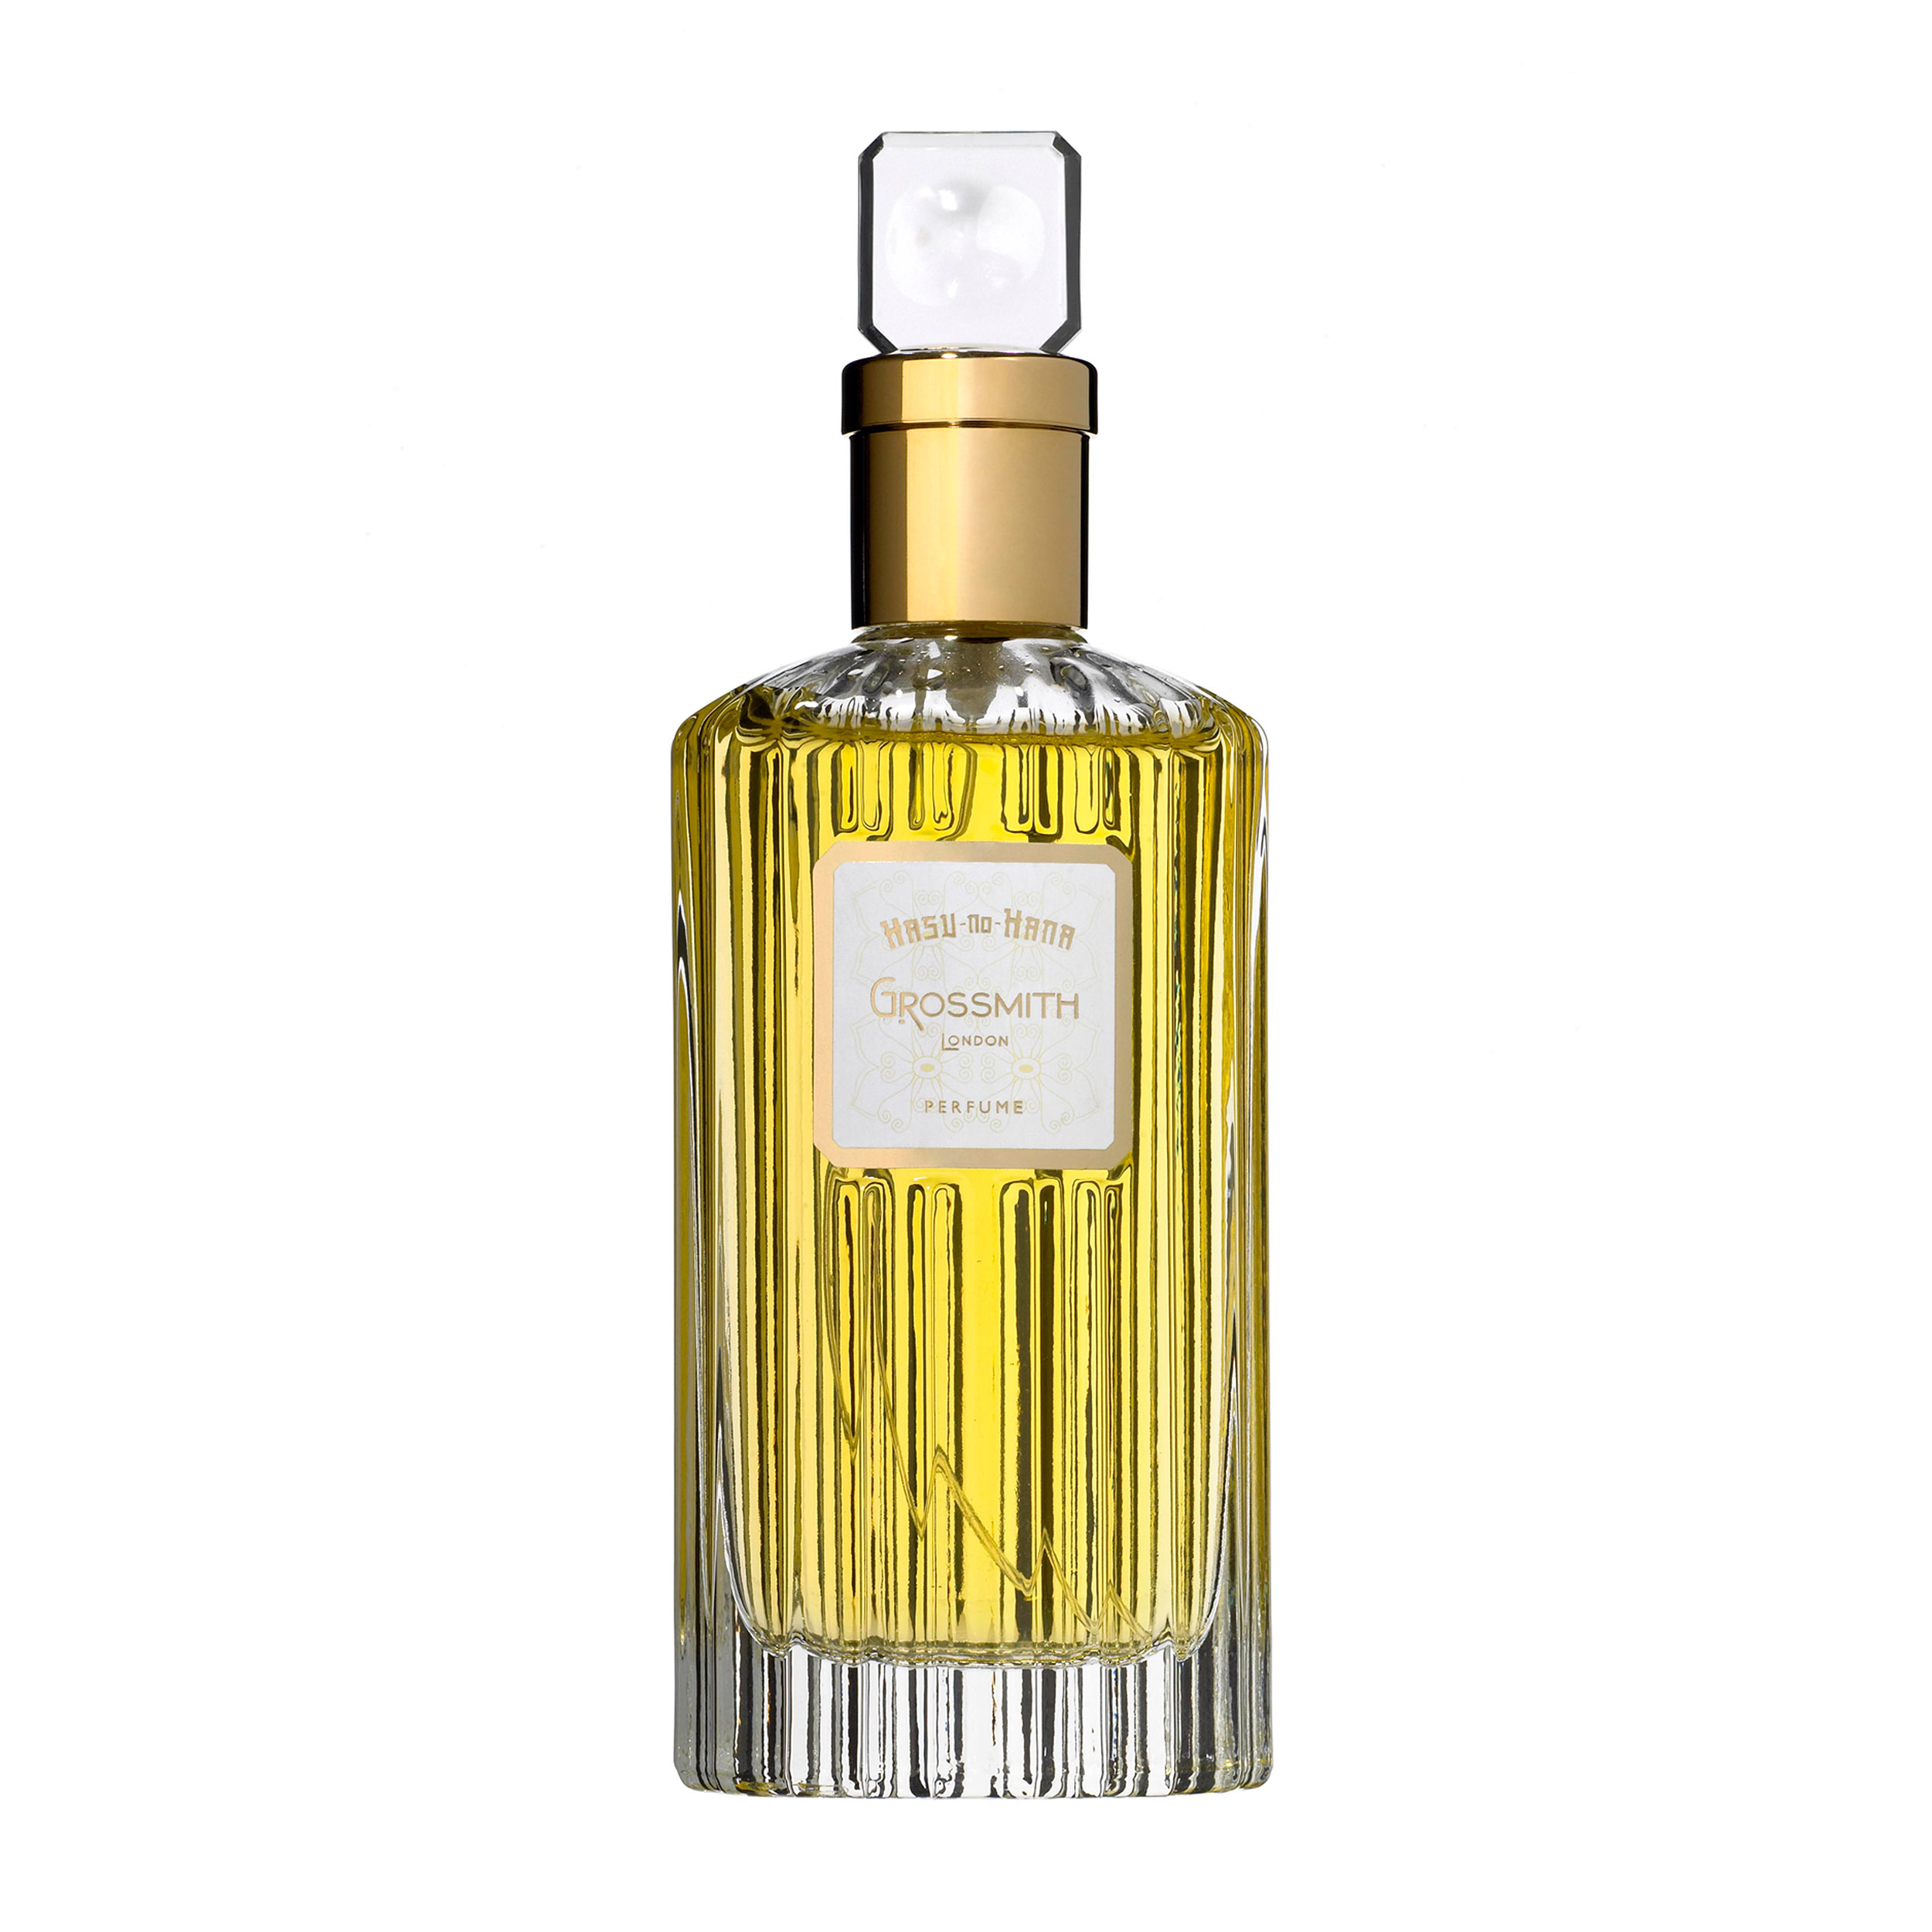 Grossmith HASU-NO-HANA Perfume 100ml